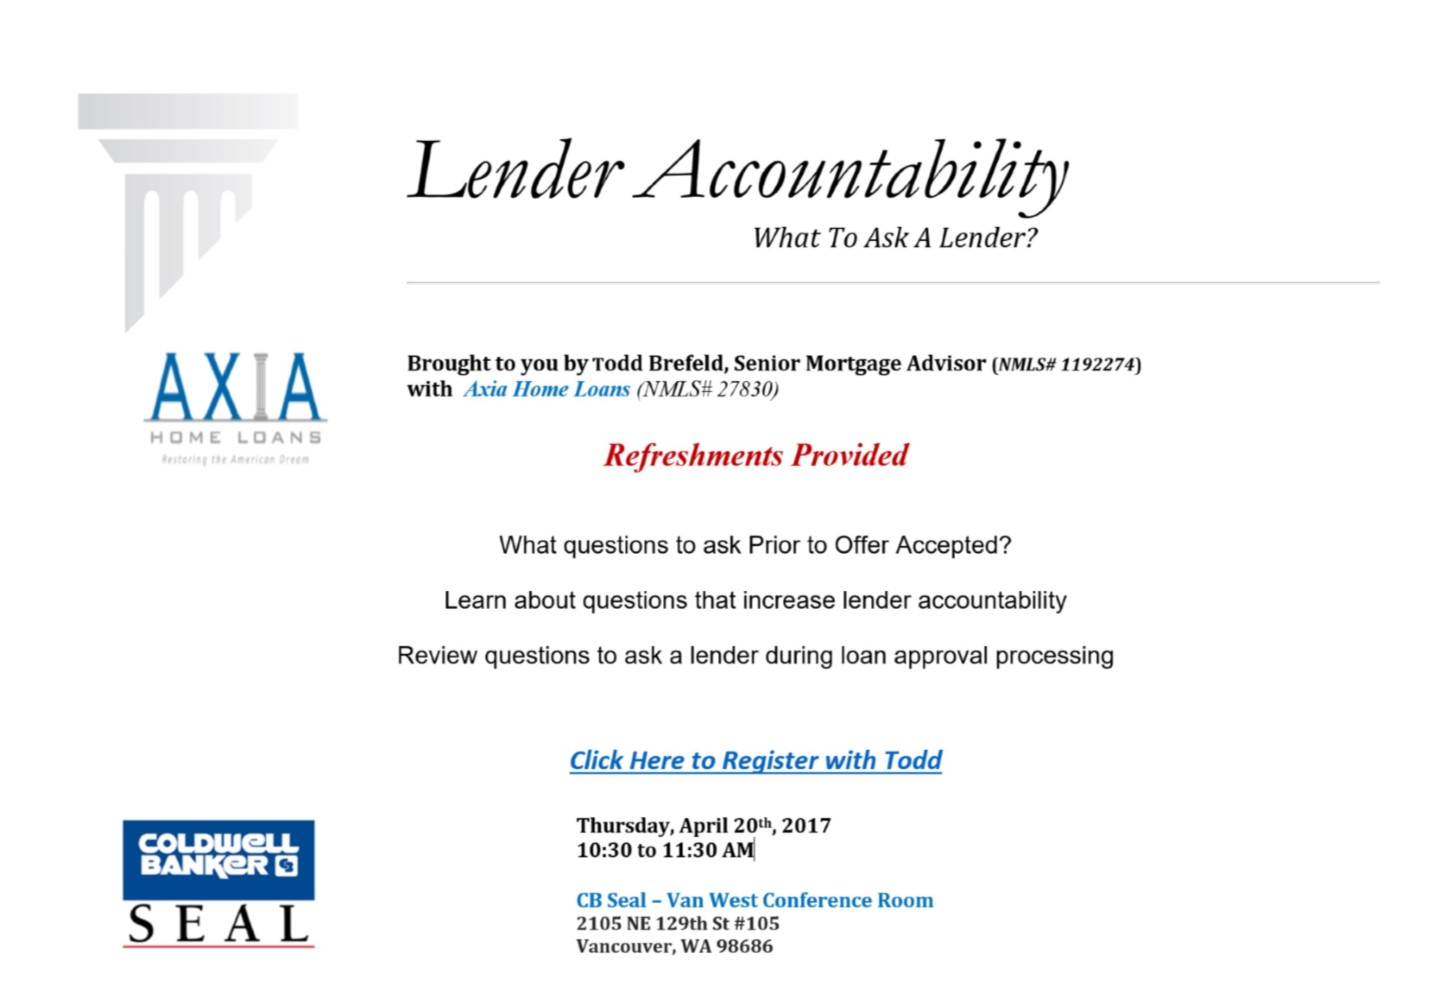 AXIA_Lender_Accountability_Van_West_April_20th